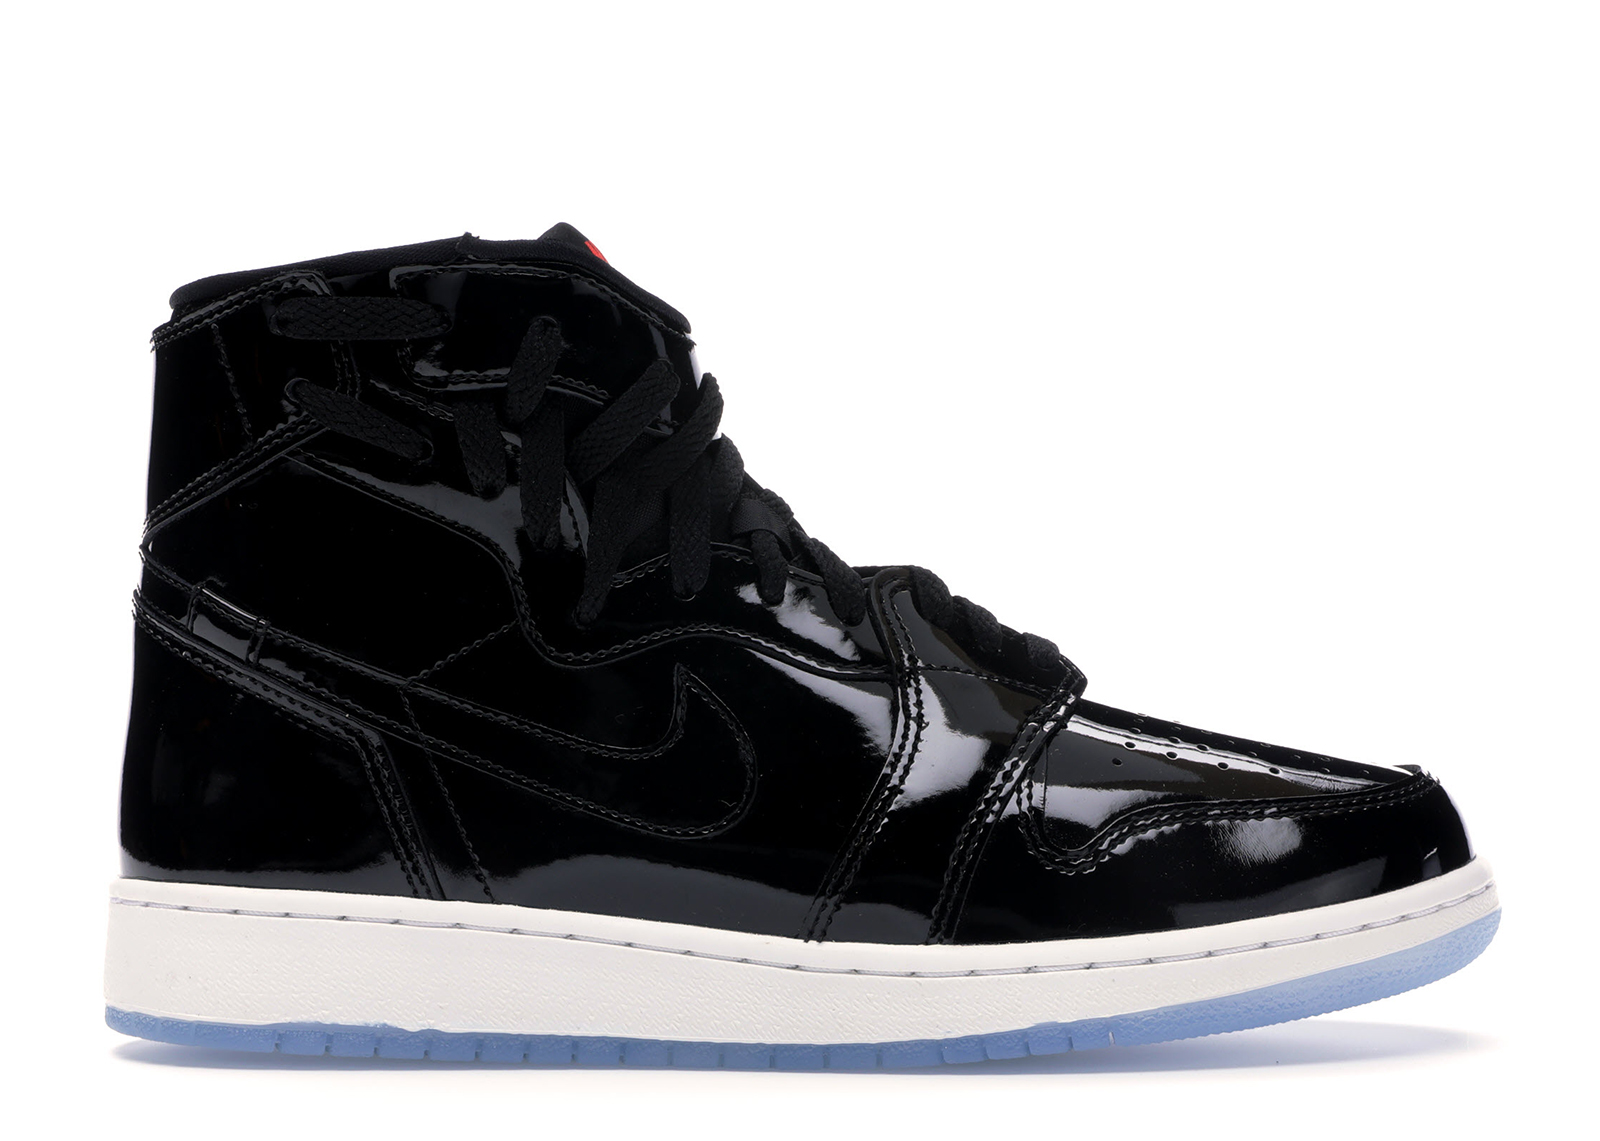 Jordan 1 Rebel XX Black Patent (W